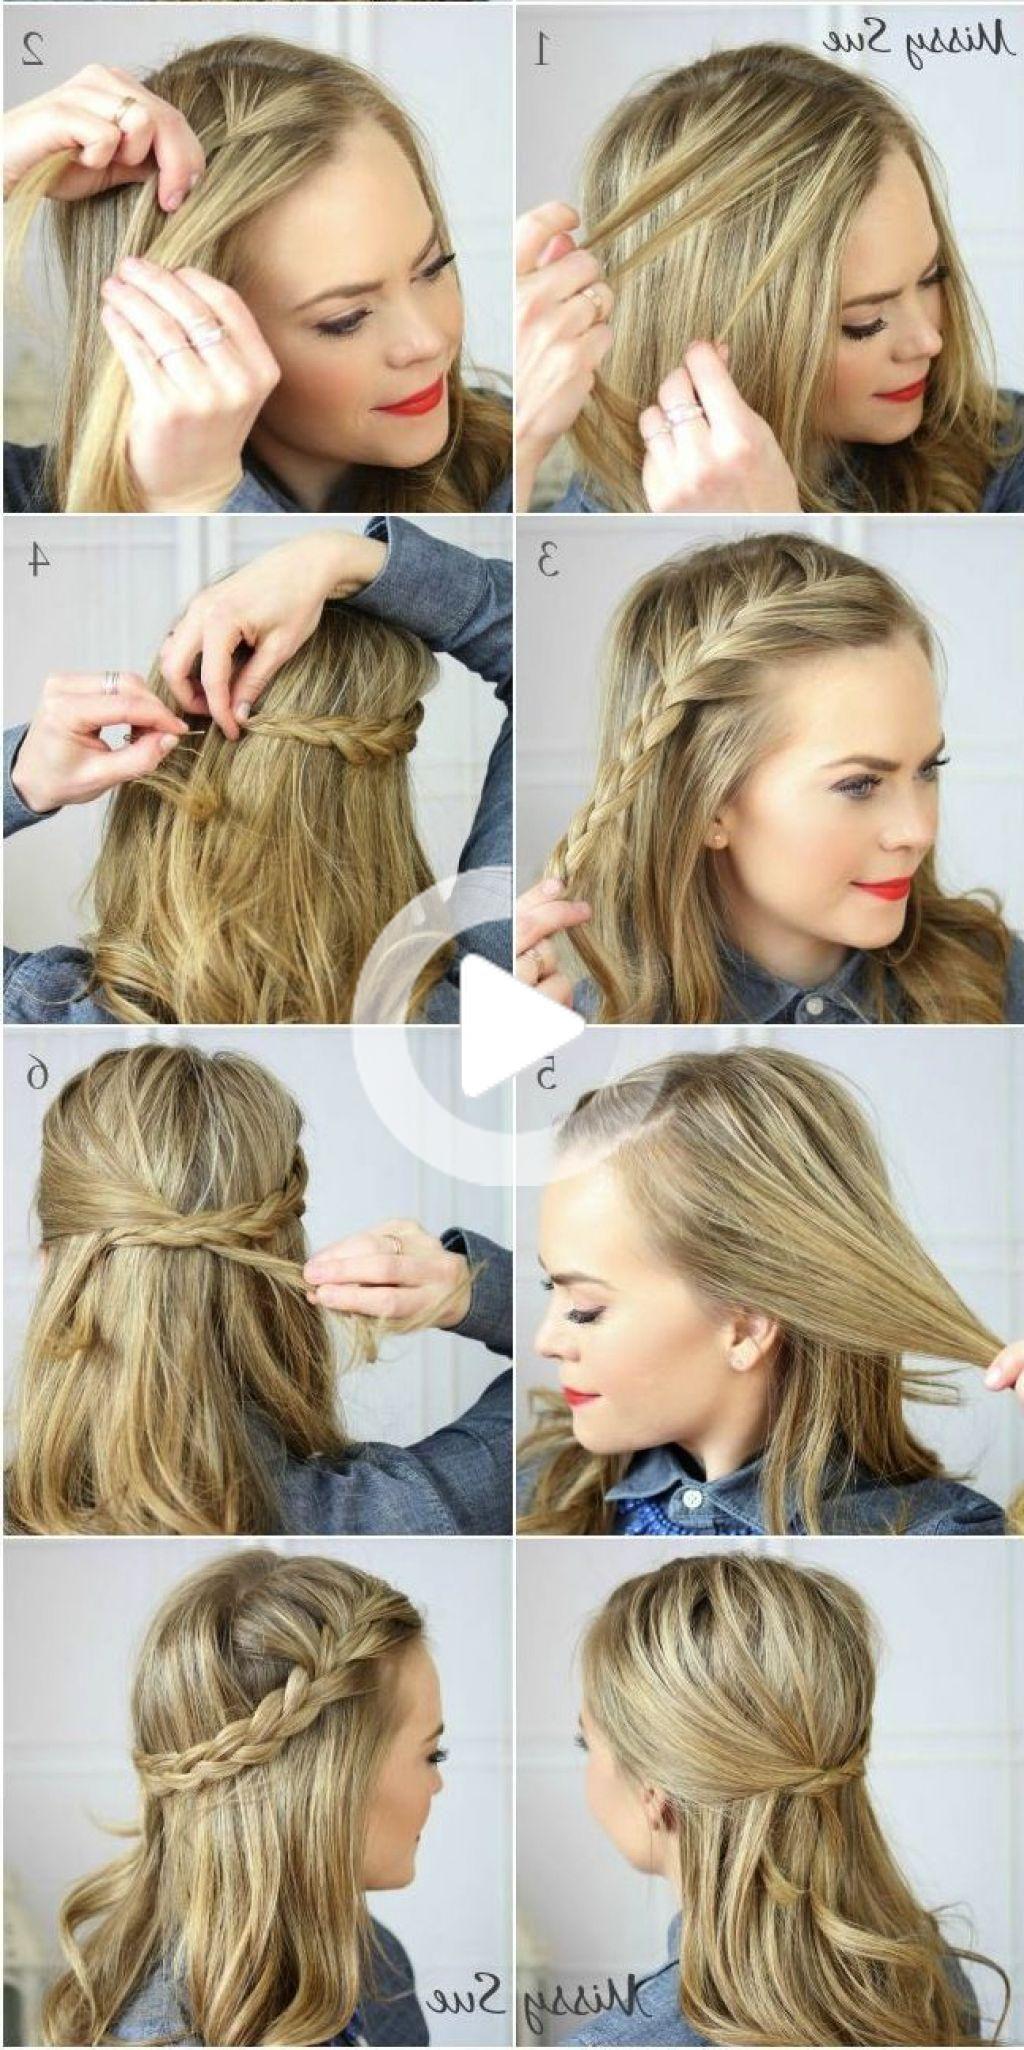 Cute Hairstyles For Medium Hair Easy To Do On Yourself Medium Hairstyle Cute E Medium Hair Styles Cute Hairstyles For Medium Hair Medium Length Hair St Medium Hair